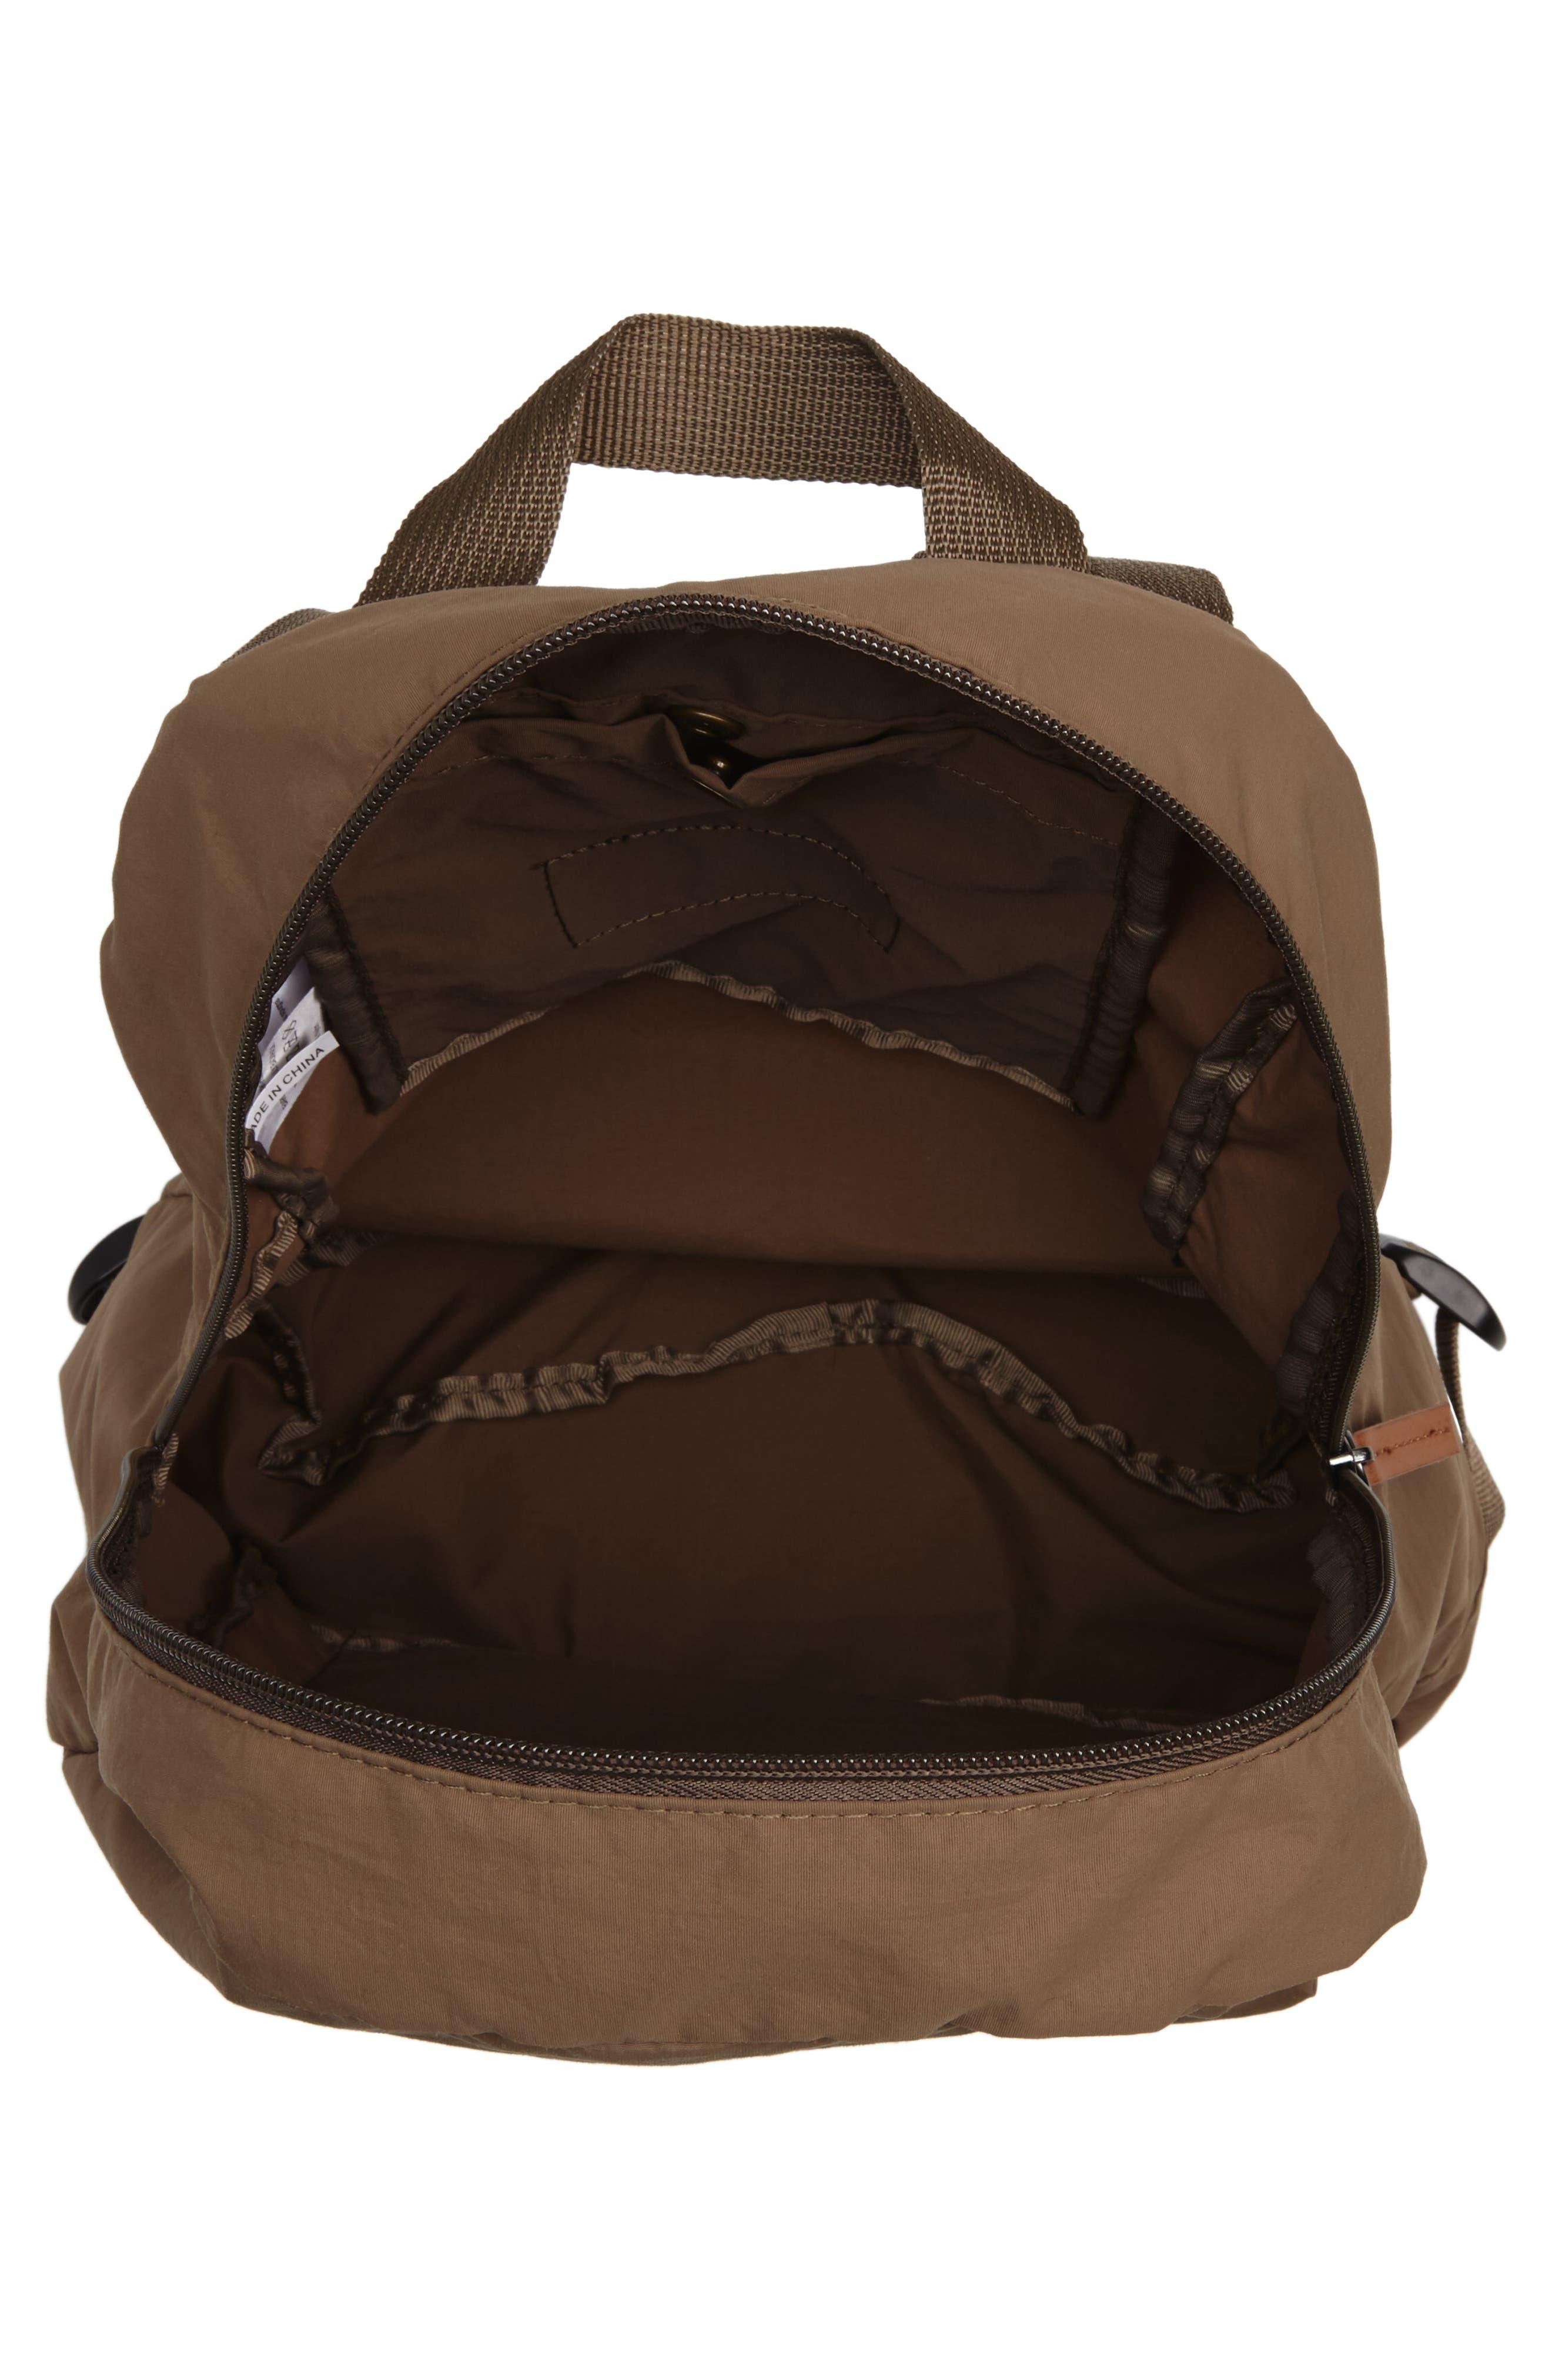 Beauly Packable Backpack,                             Alternate thumbnail 4, color,                             KHAKI